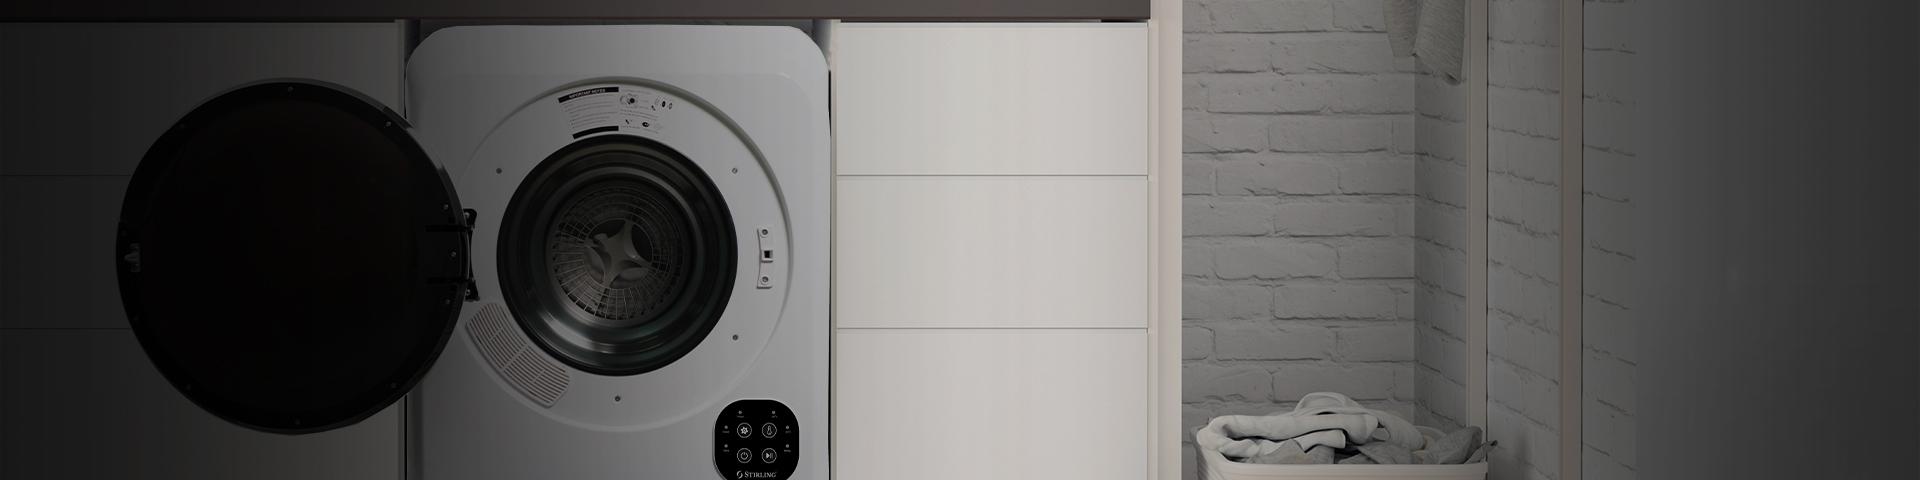 5kg clothes dryer-banner-blank